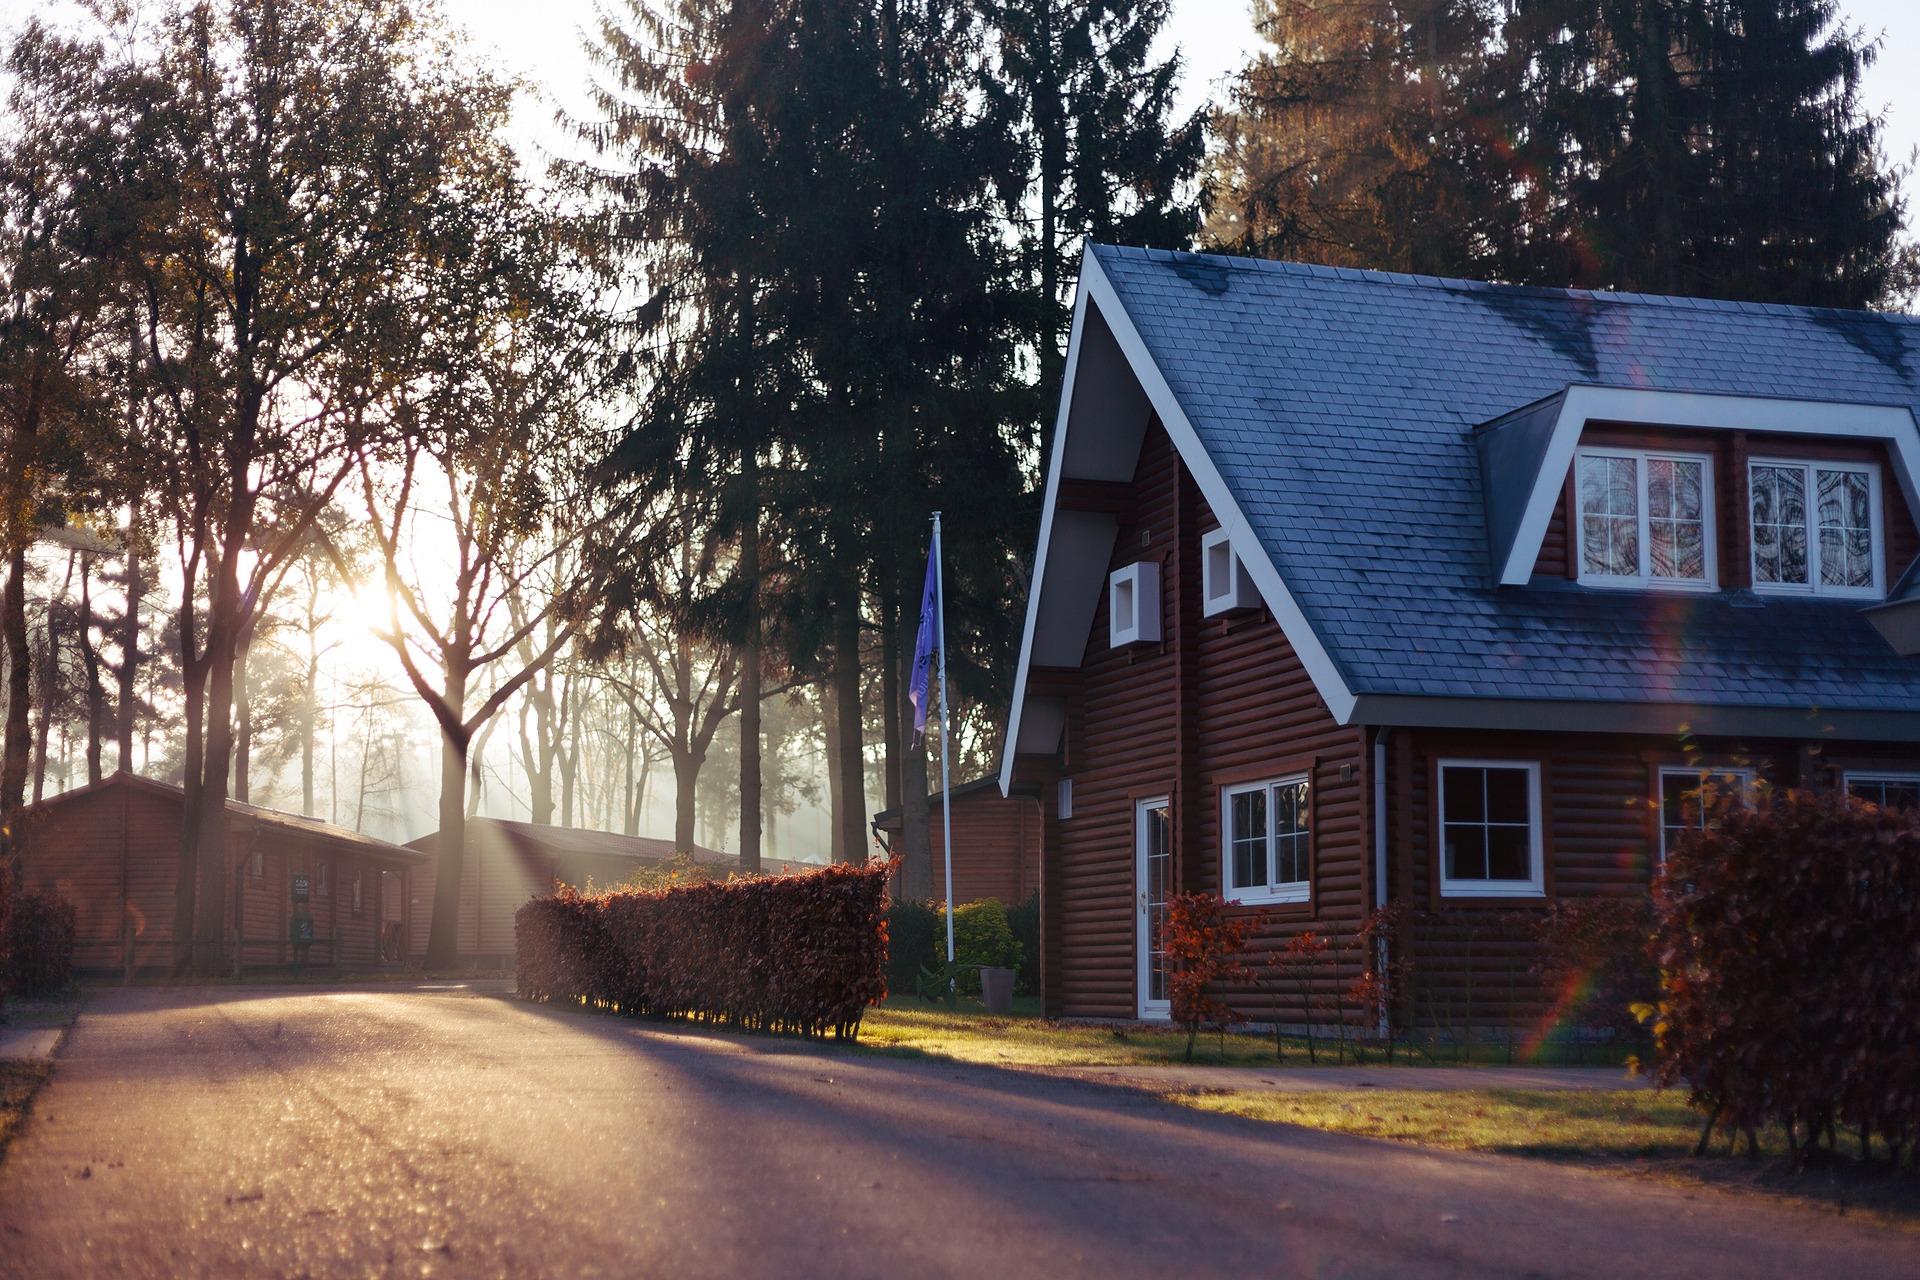 home in forest neighborhood